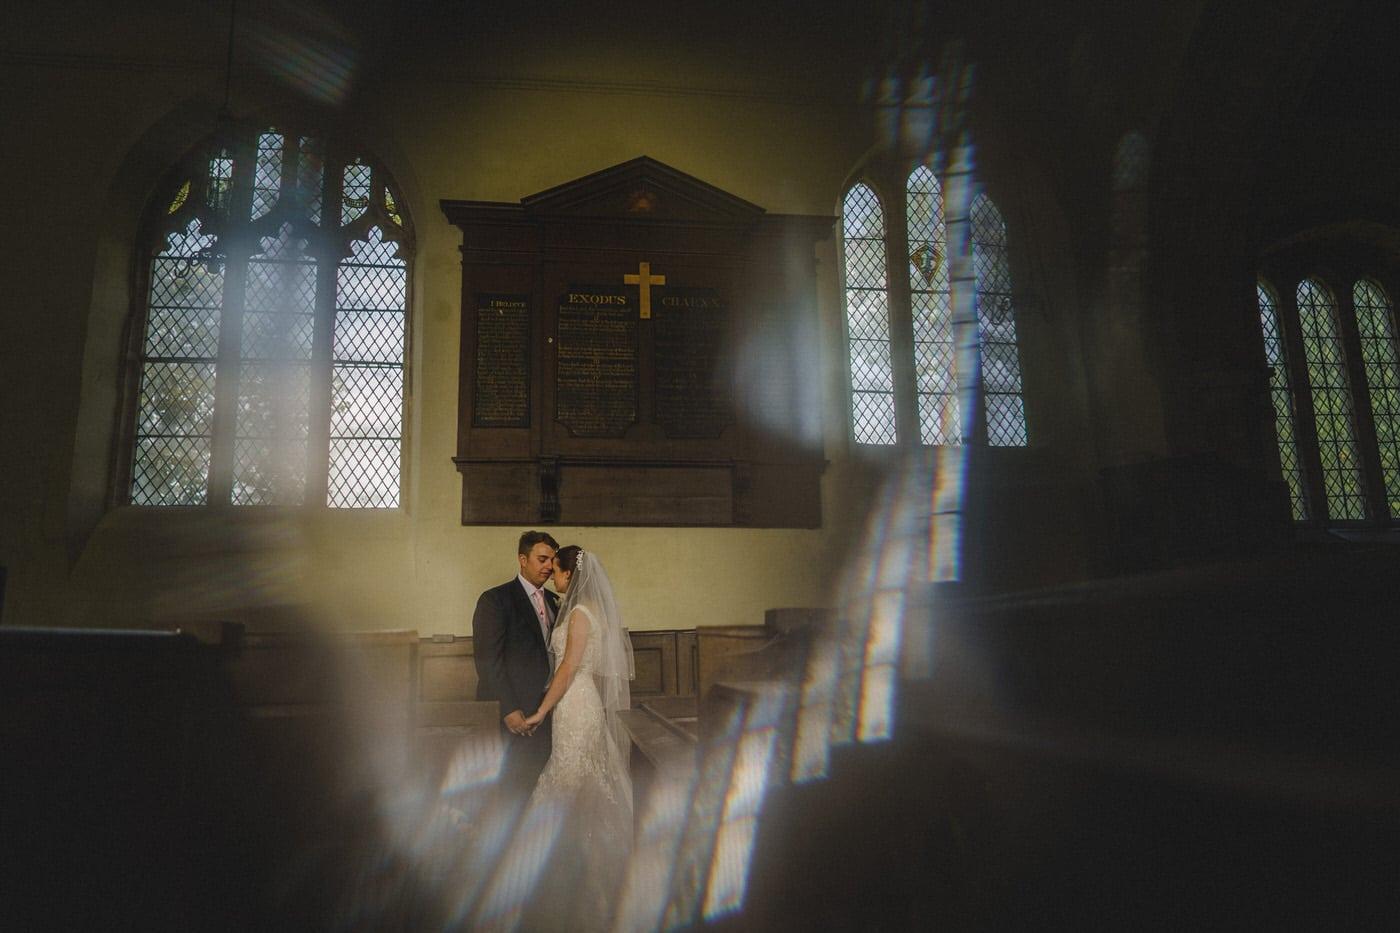 MN SHROPSHIRE WEDDING 501